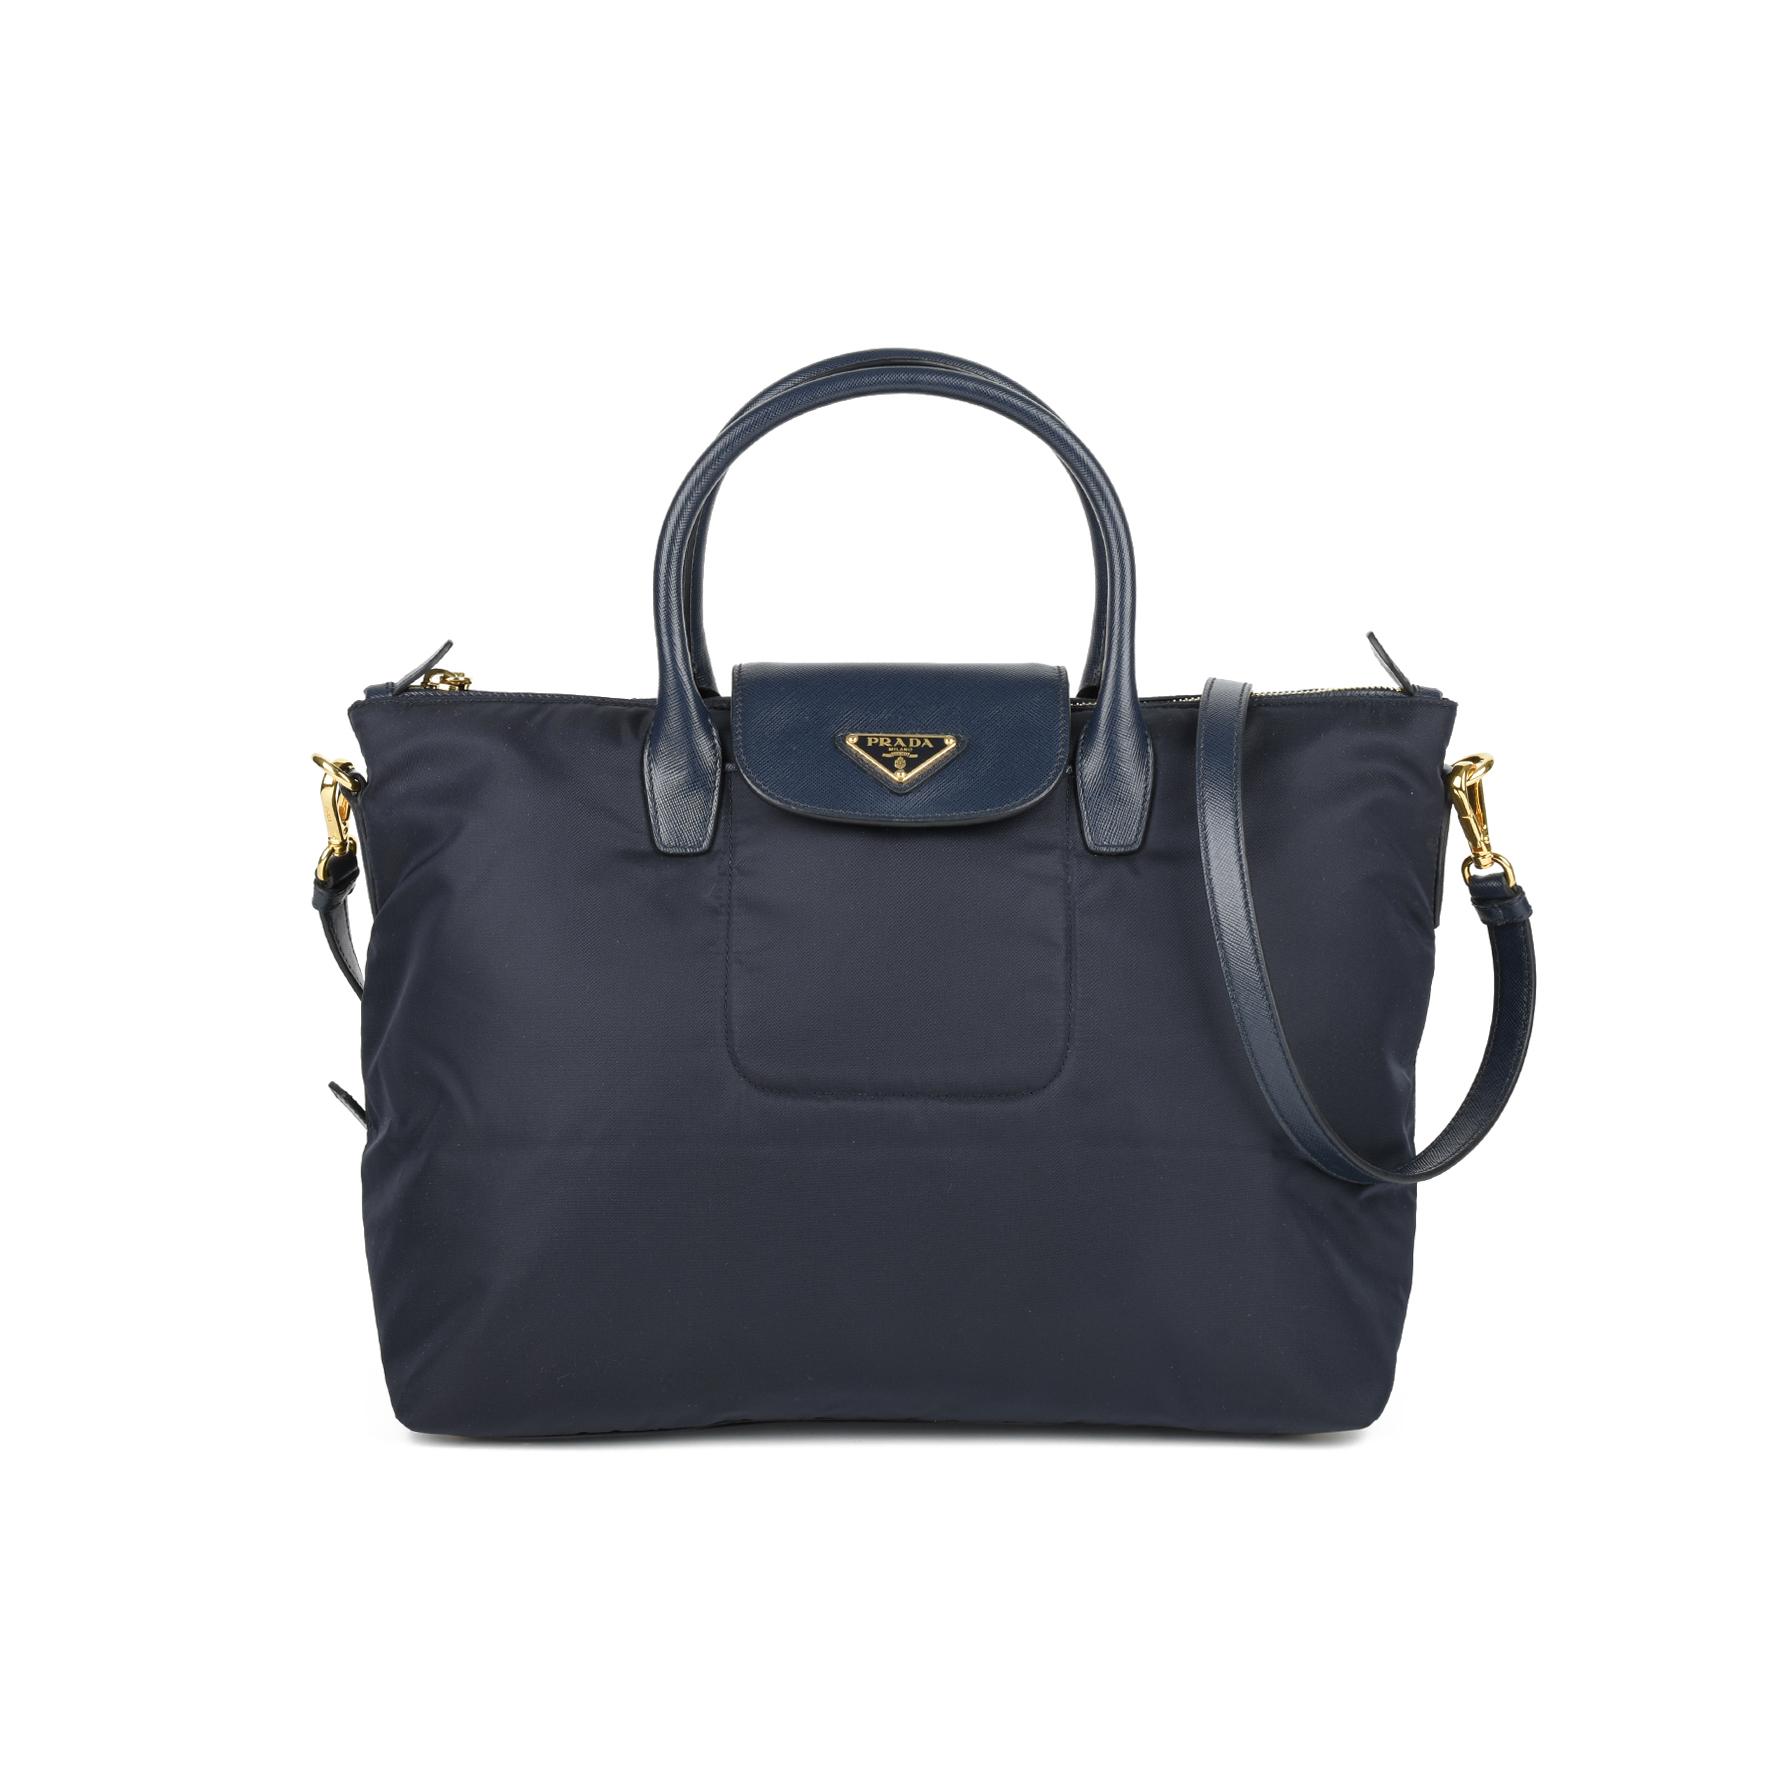 705787e135 Authentic Second Hand Prada Tessuto Saffiano Tote Bag (PSS-446-00005) - THE  FIFTH COLLECTION